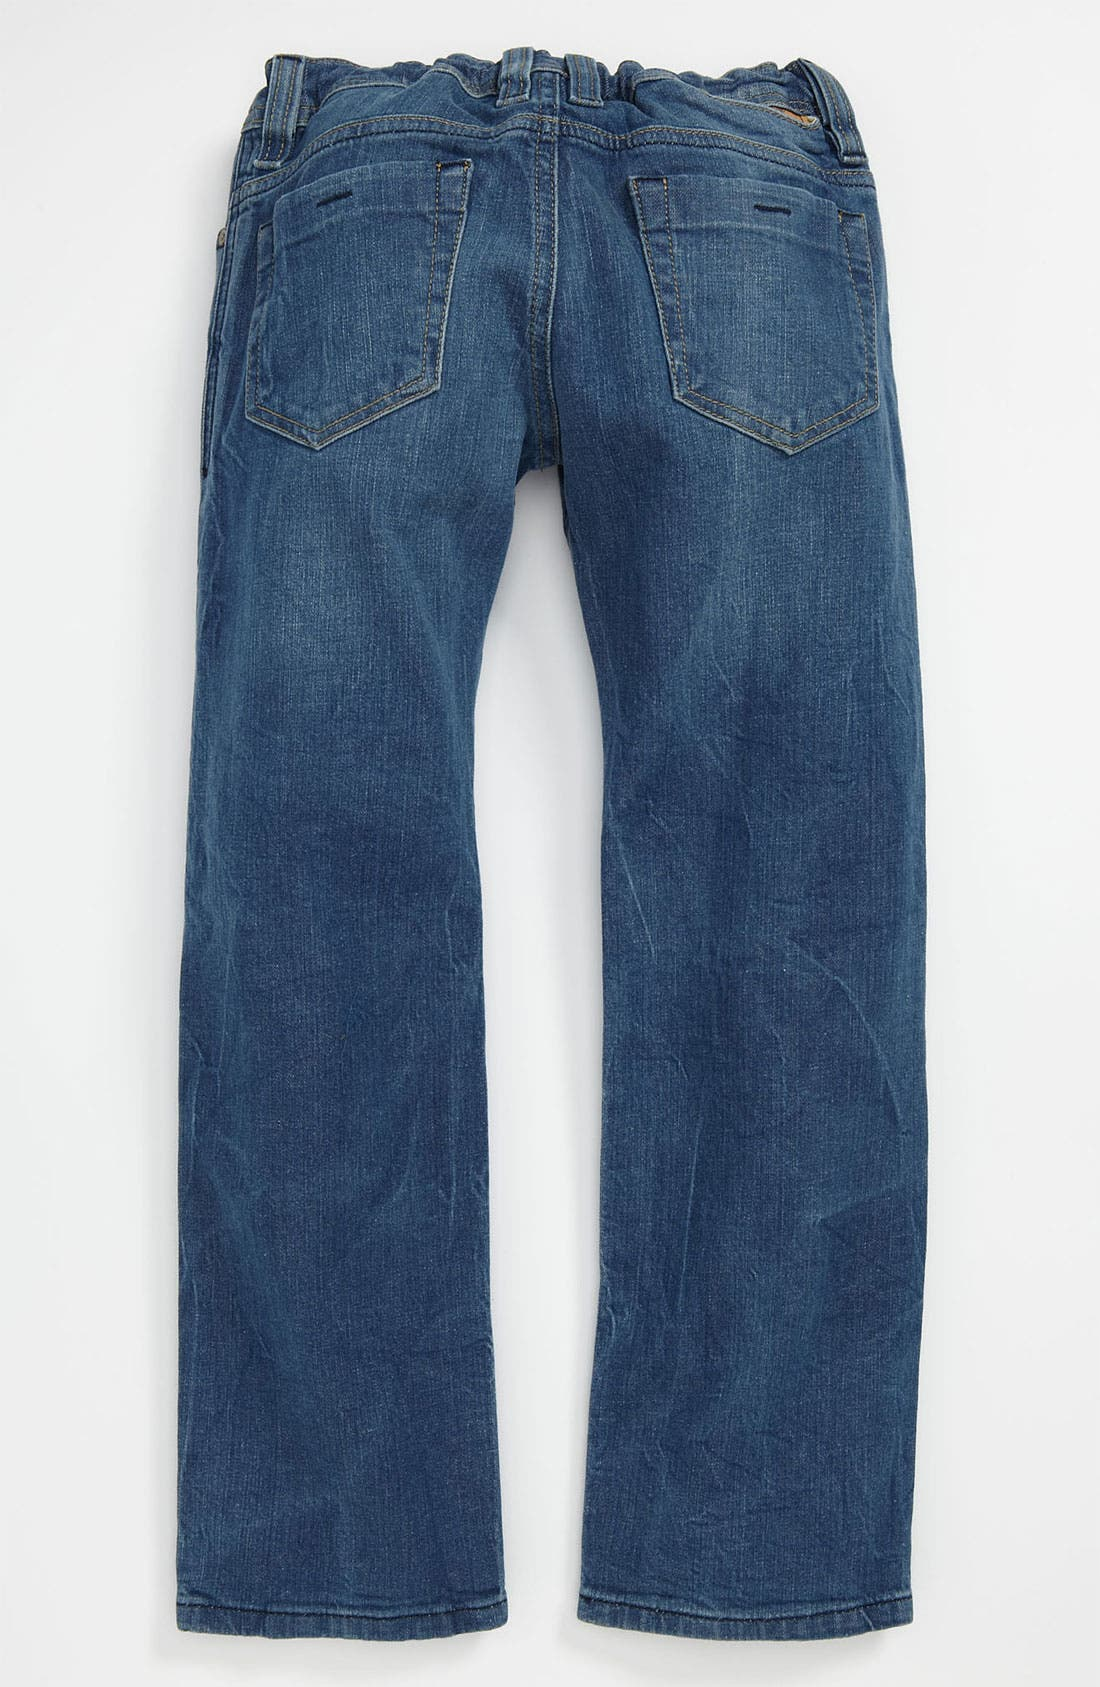 Main Image - DIESEL® 'Safado' Jeans (Little Boys & Big Boys)